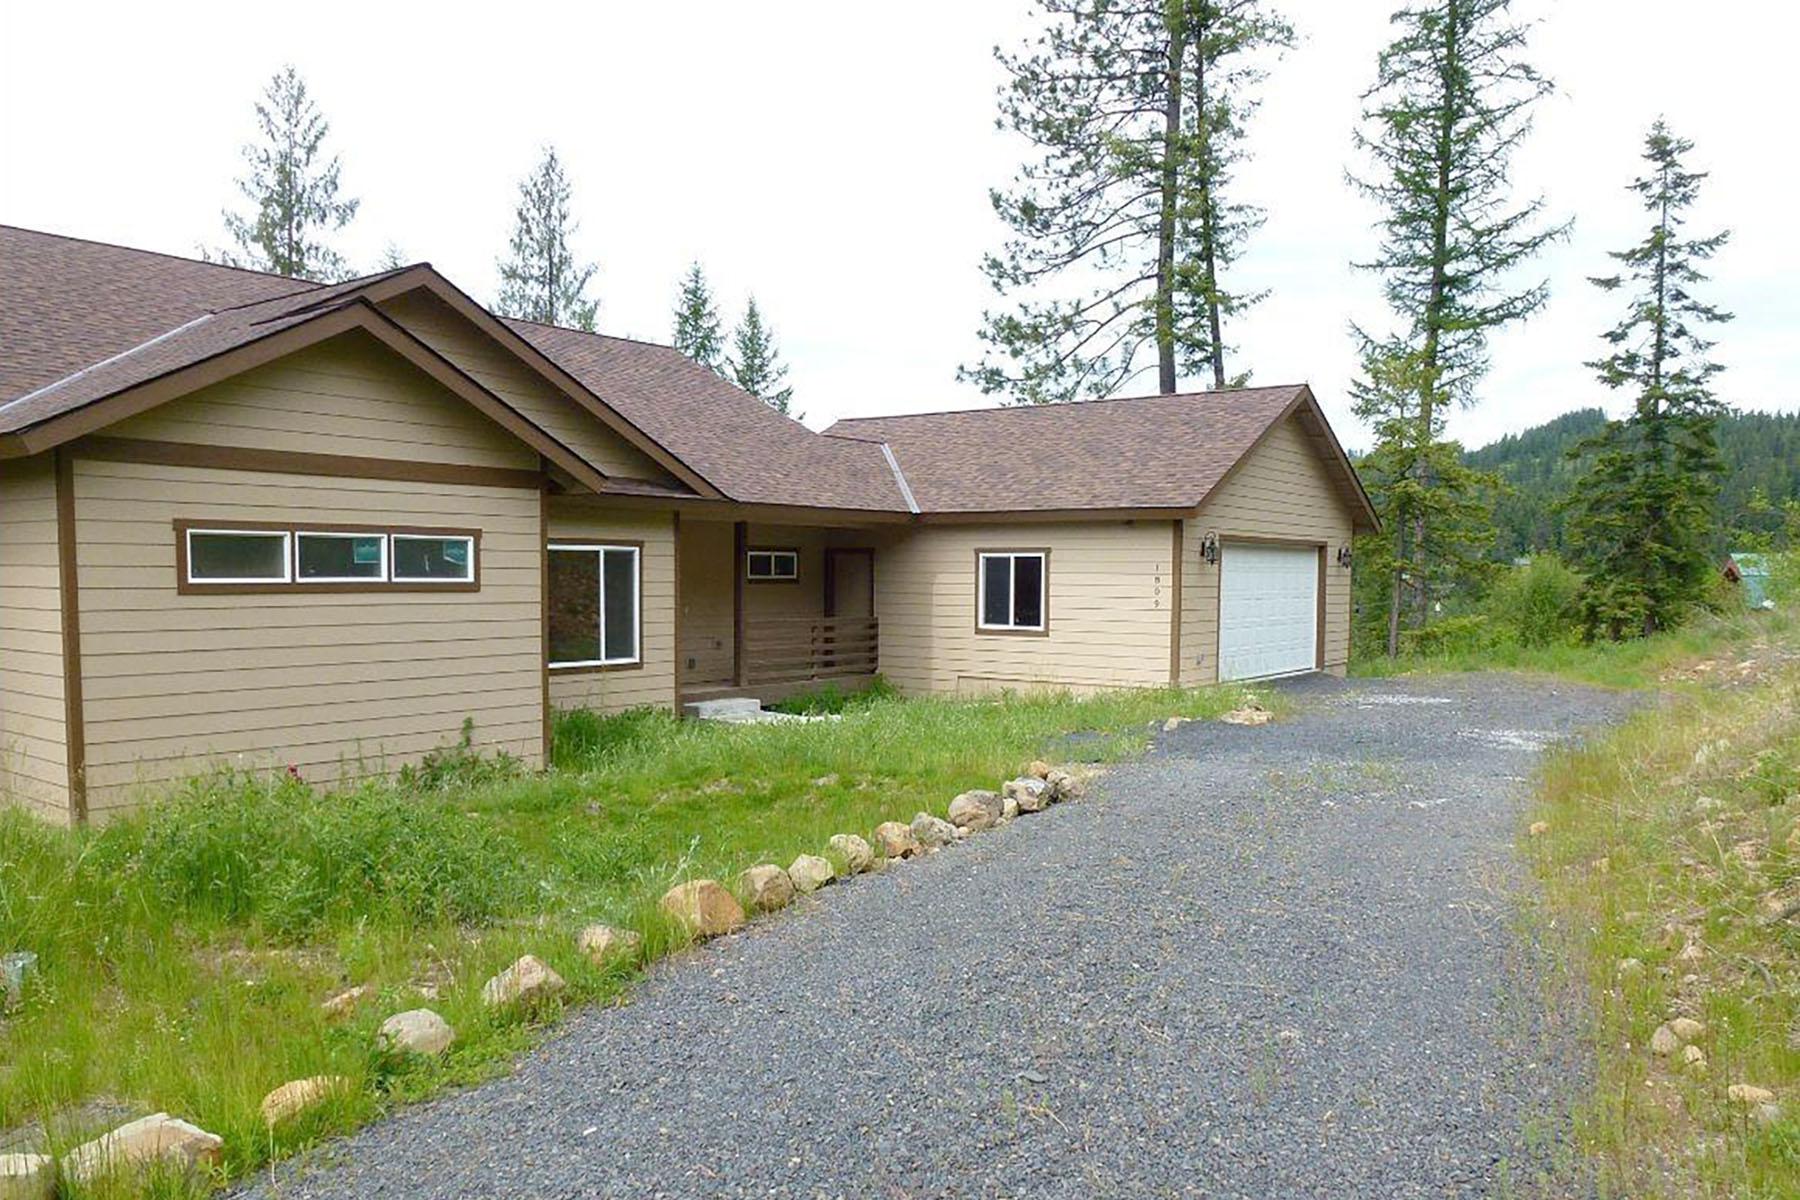 Casa para uma família para Venda às New construction with great views of Coeur d' Alene Lake 1890 E Flying Eagle RD Harrison, Idaho, 83833 Estados Unidos